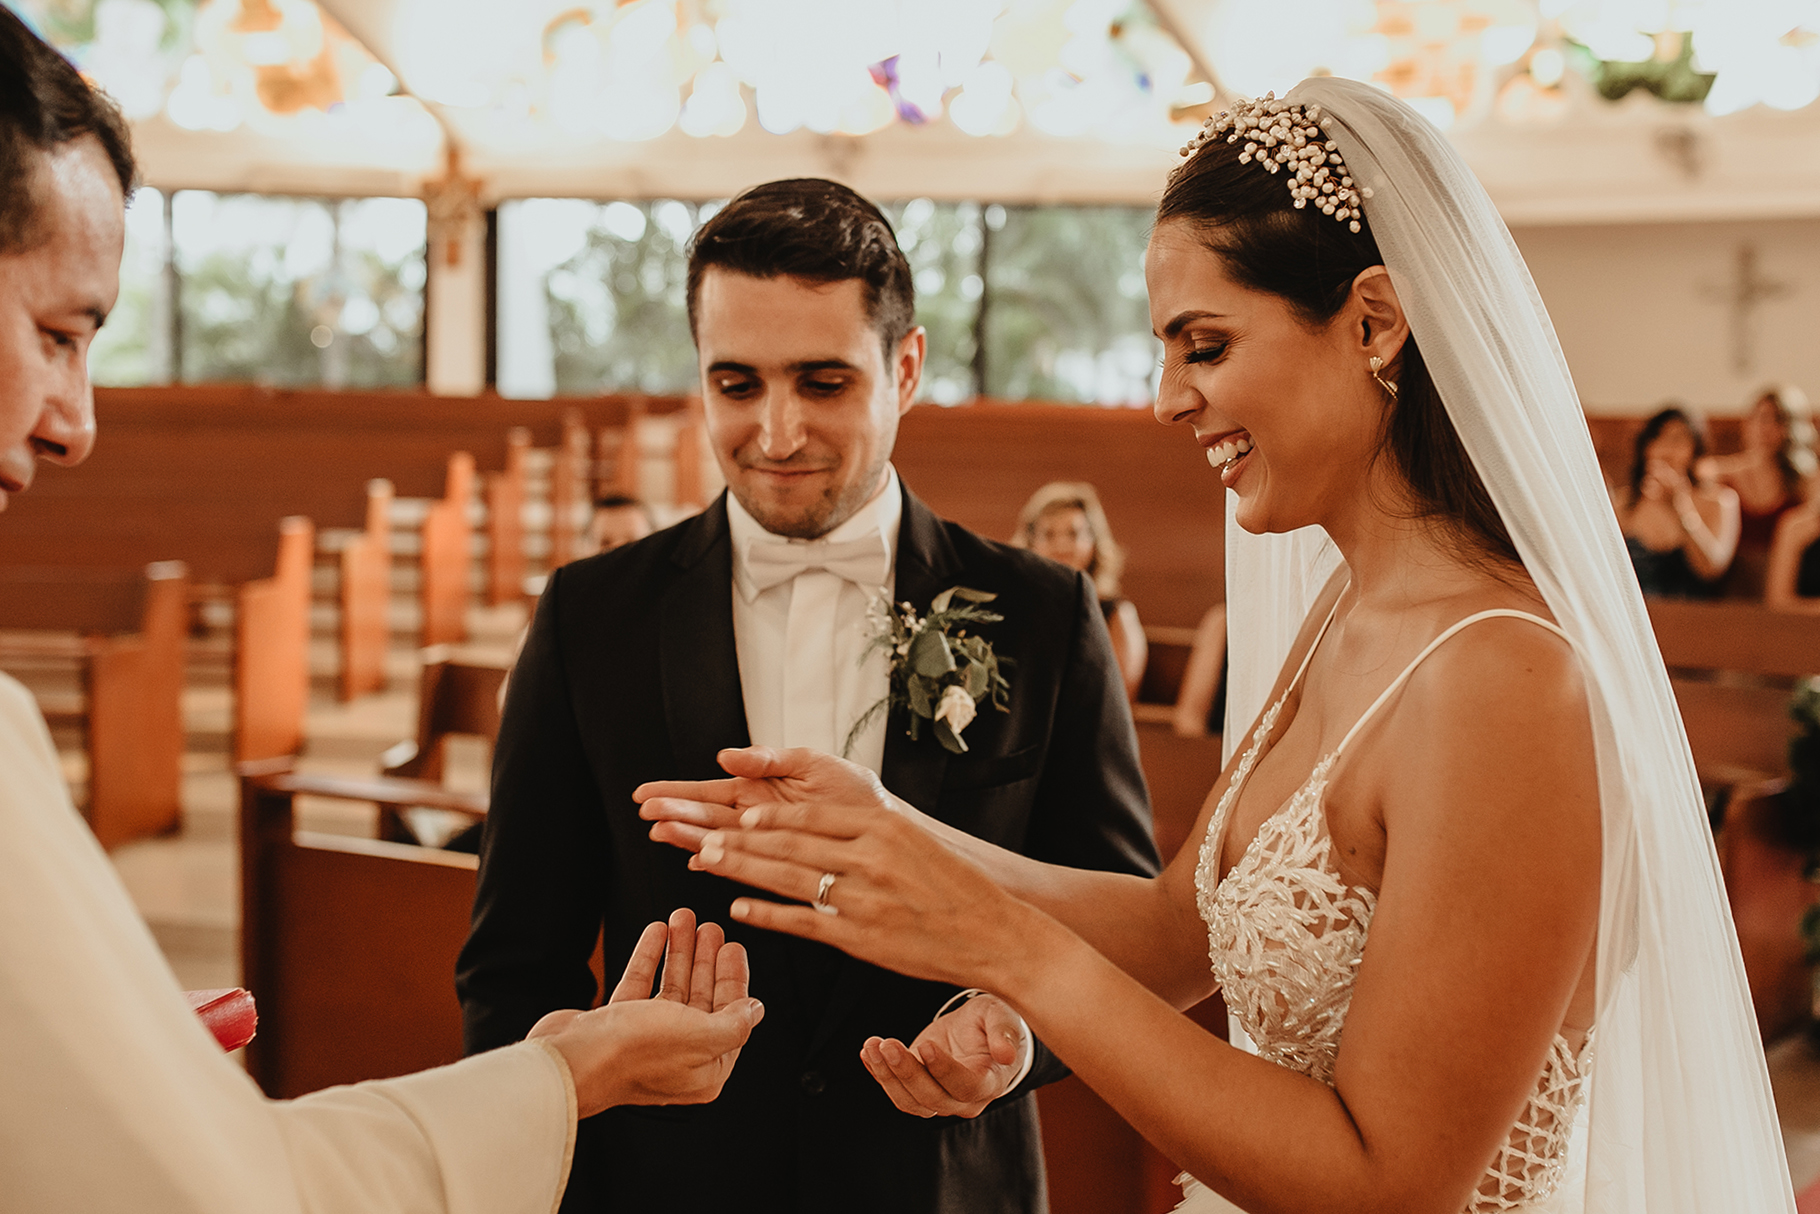 0675R&F__WeddingDestination_Weddingmerida_BodaMexico_FotografoDeBodas_FabrizioSimoneenFotografo.jpg